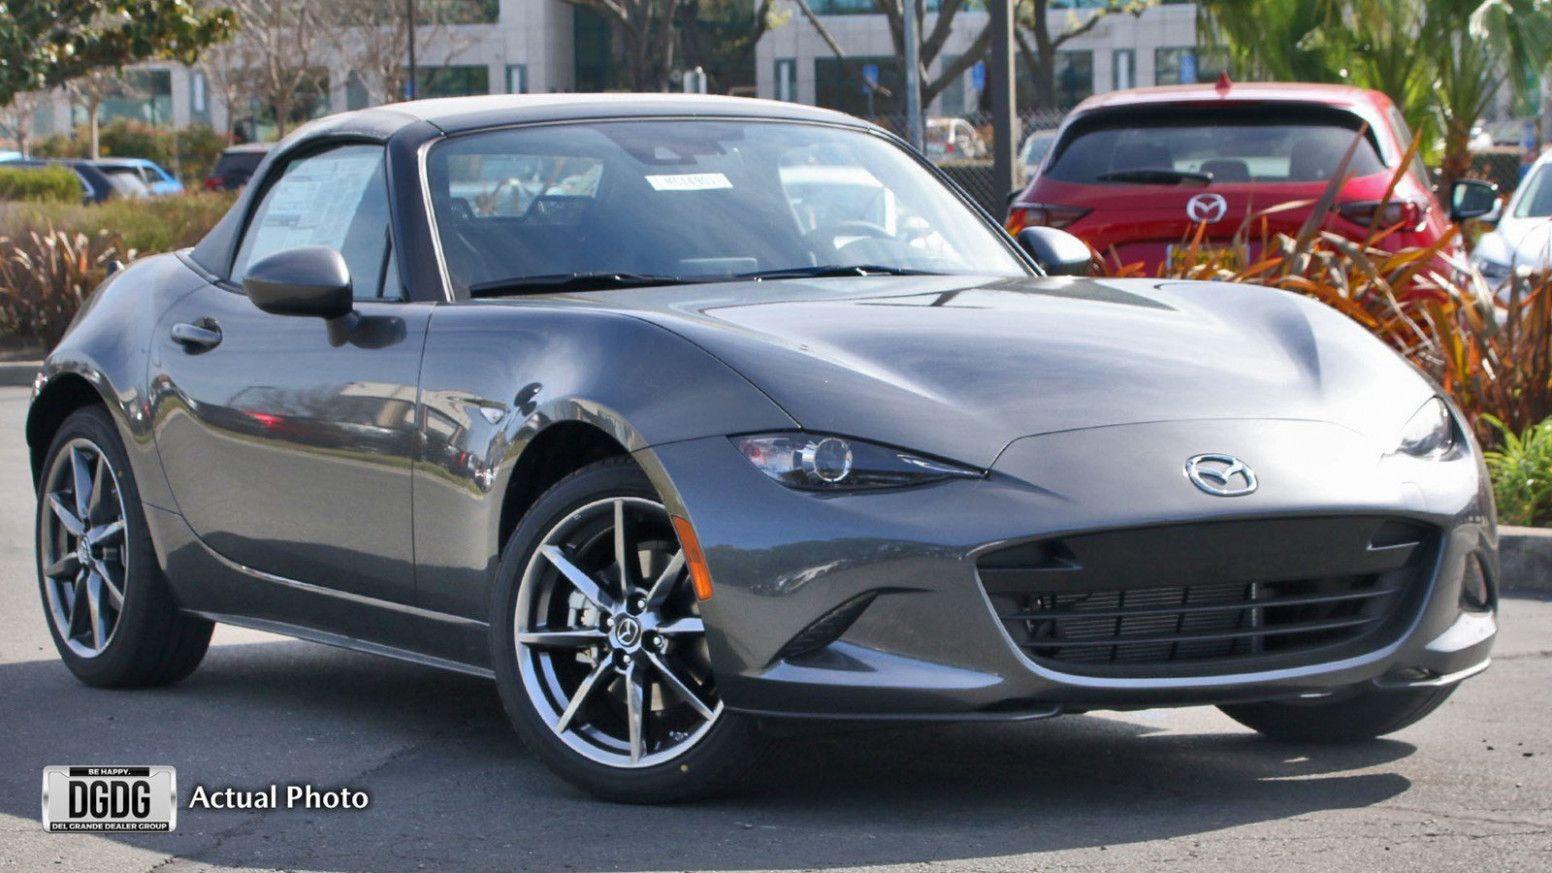 2020 Mazda Miata Availability in 2020 Mazda mx5 miata